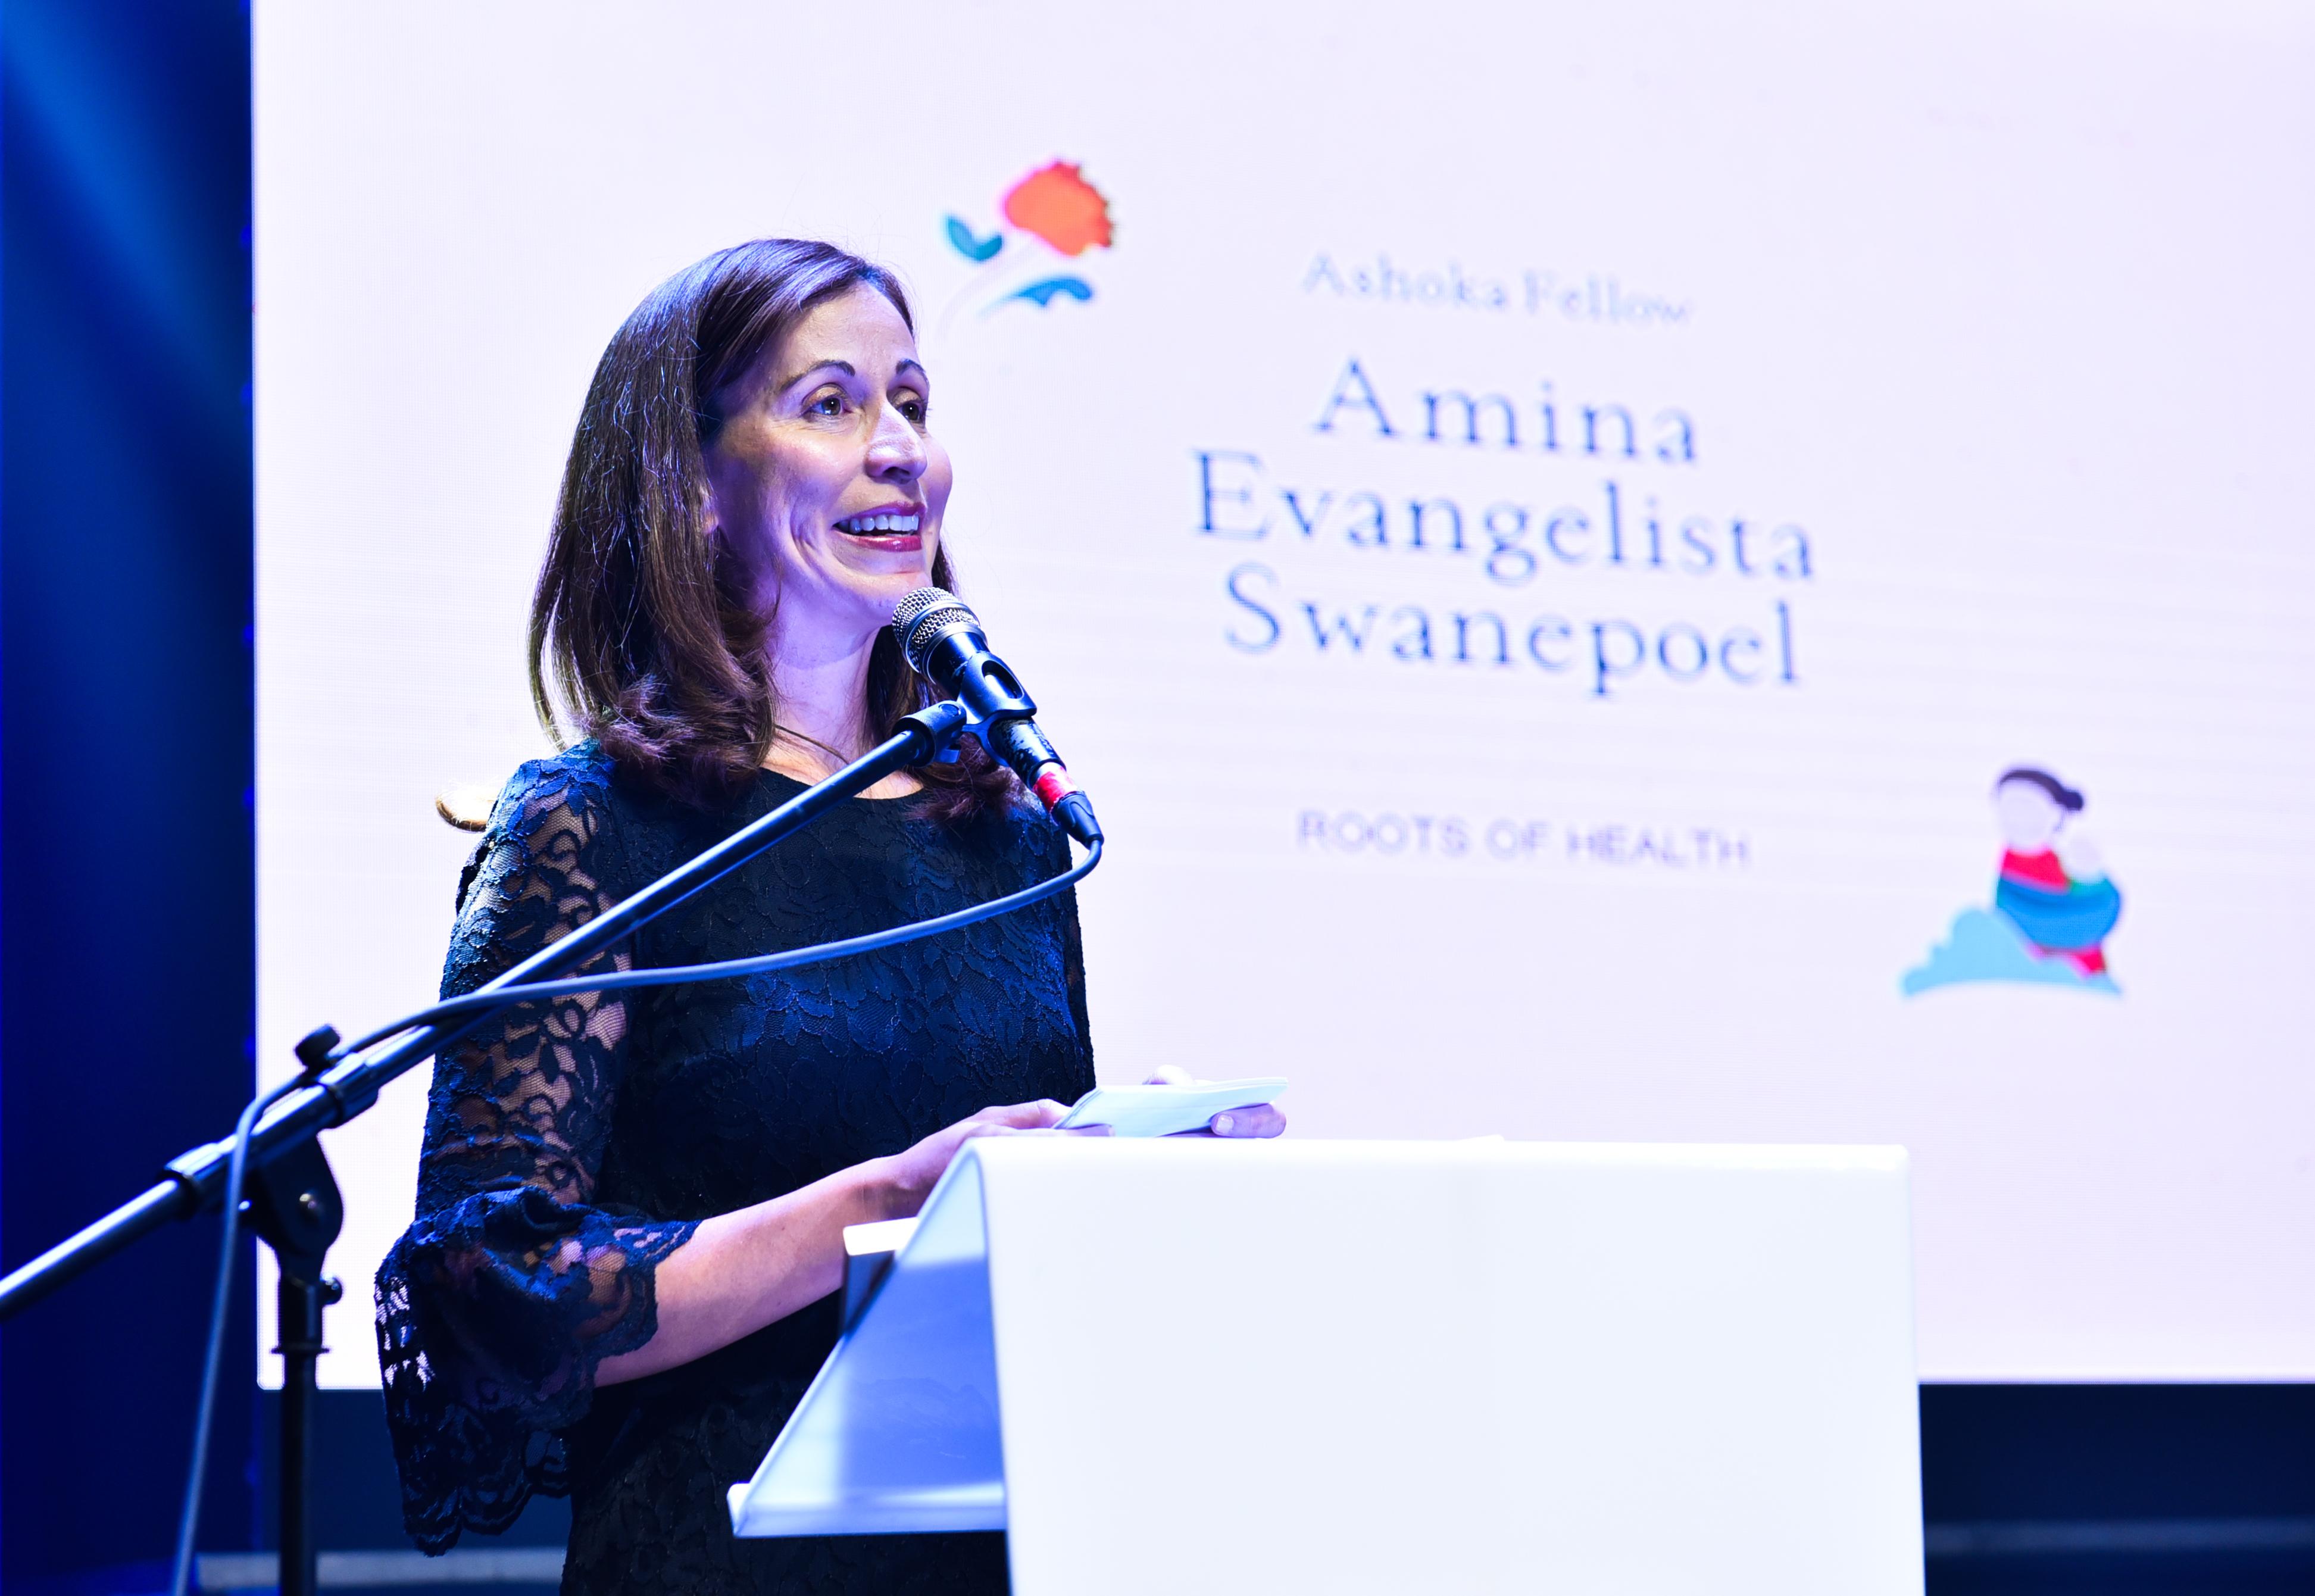 Ashoka Fellow Amina Evangelista Swanepoel